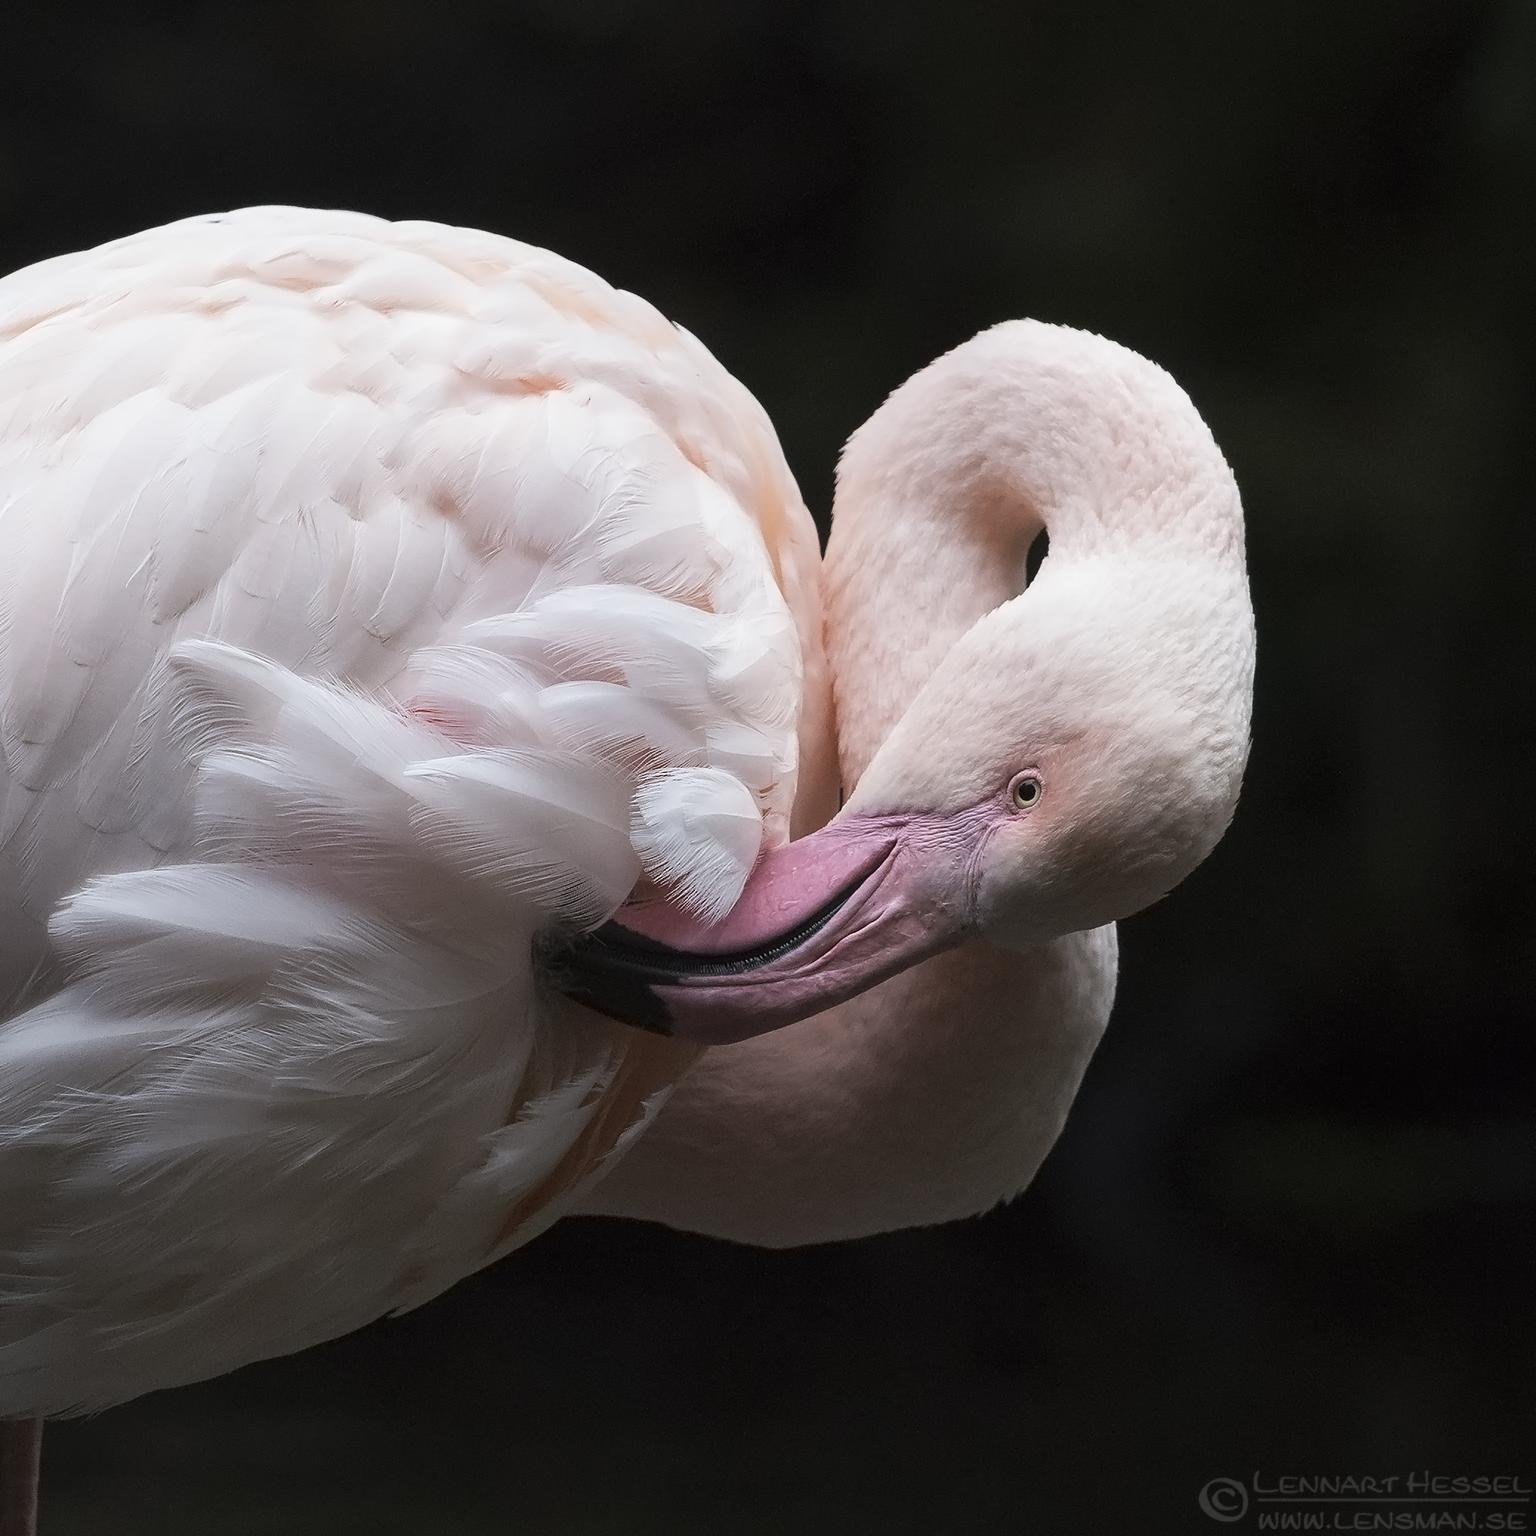 Greater Flamingo preperations